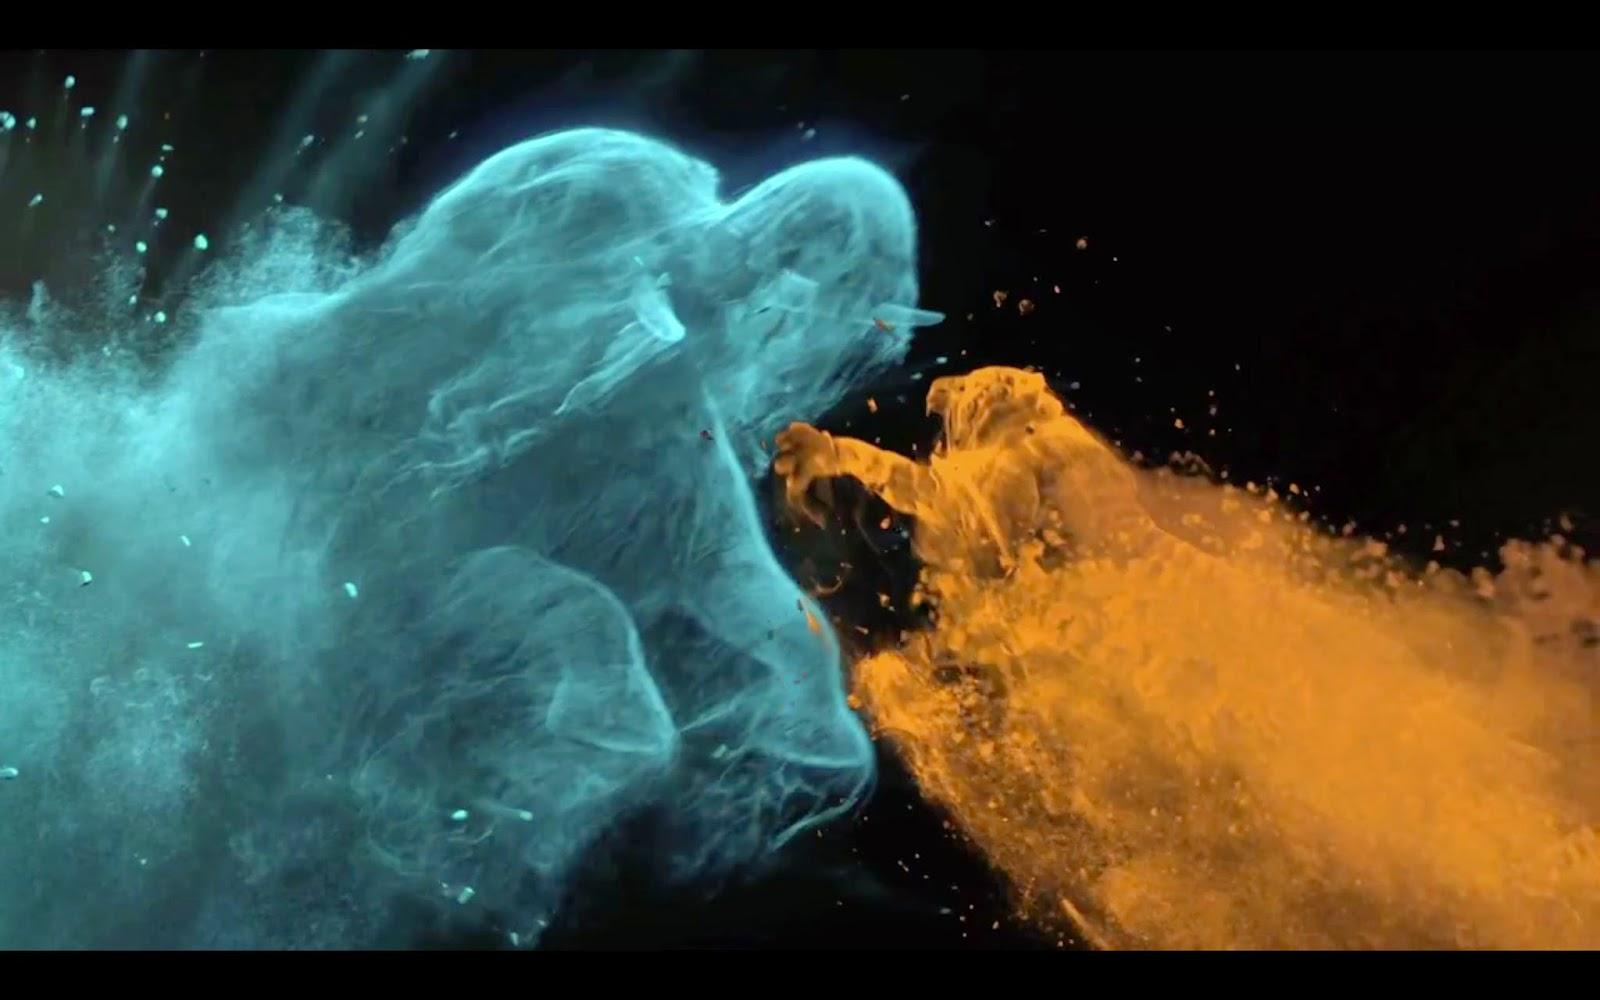 Far Cry 4 Wallpaper Elephant: Farcry 2 Trailer Wallpapers Hd : Nessmispass